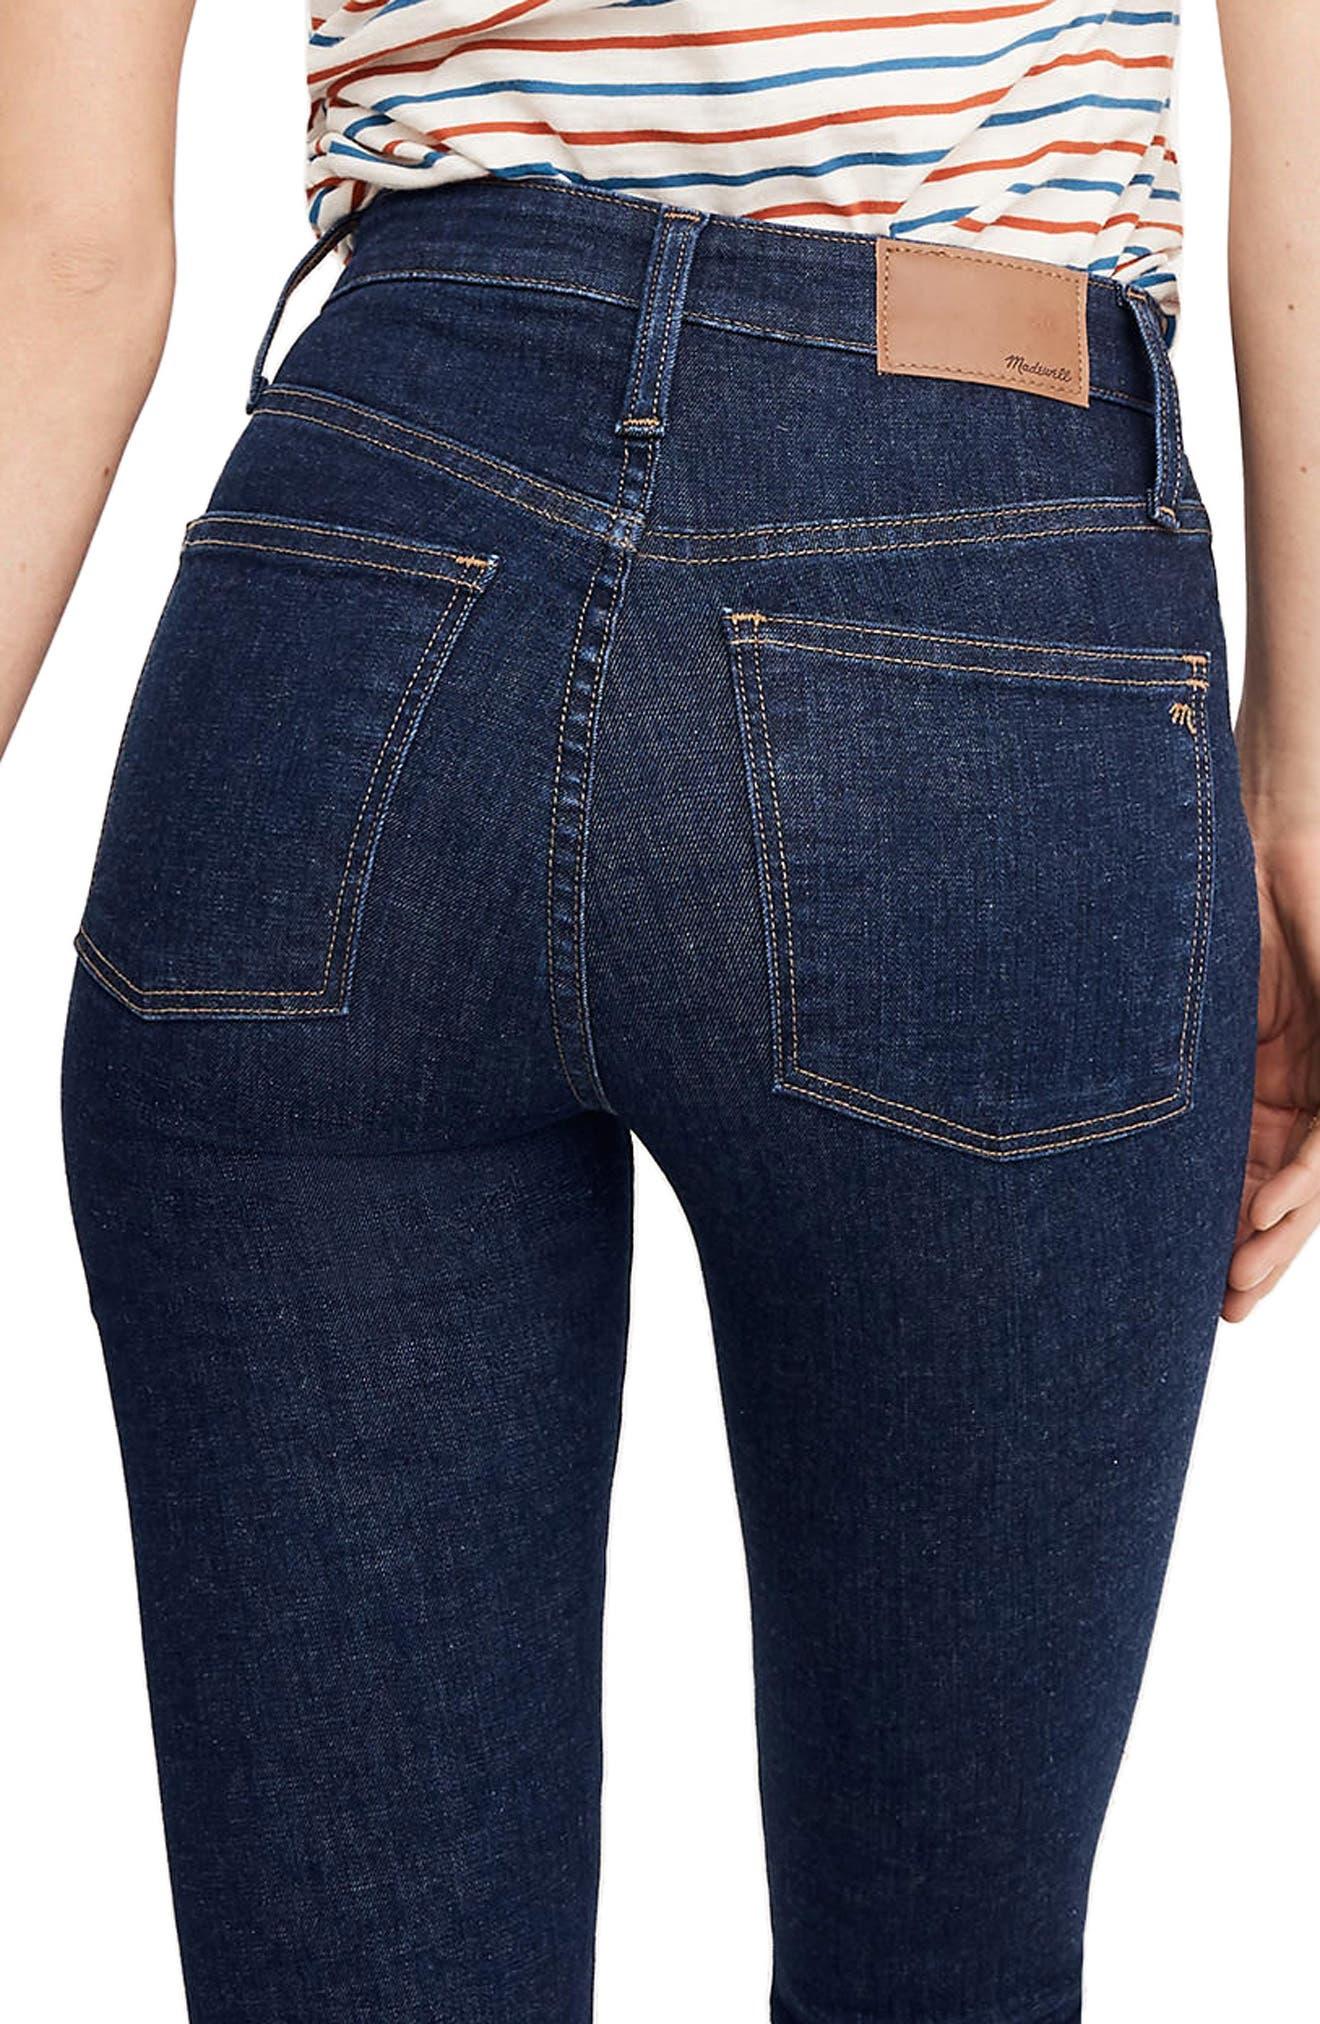 Alternate Image 3  - Madewell Curvy High Waist Skinny Jeans (Lucille)